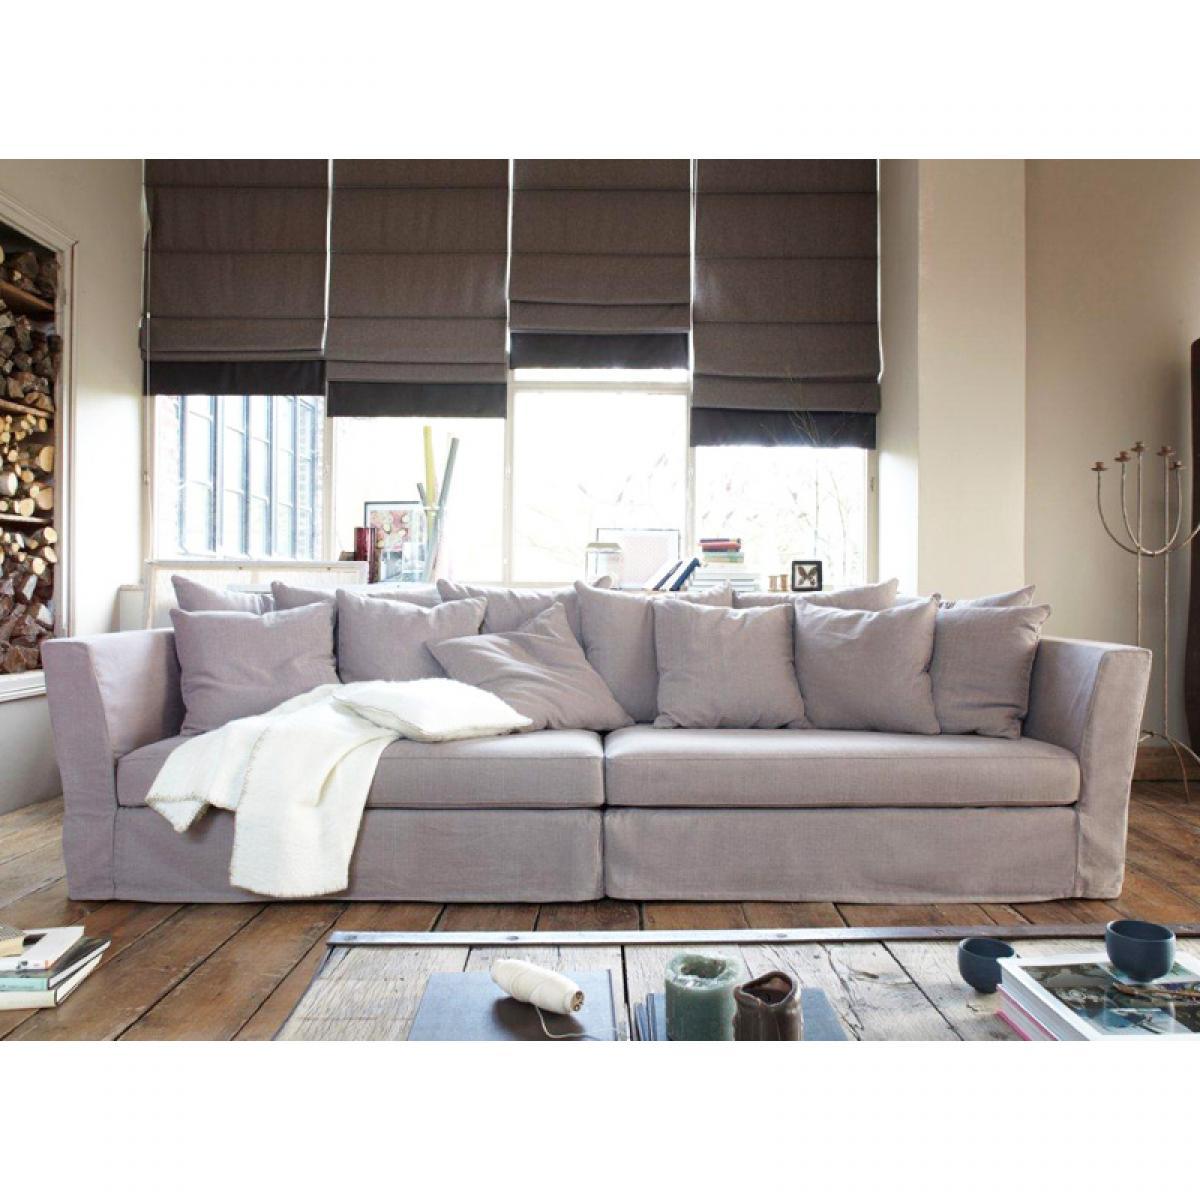 photos canap home spirit. Black Bedroom Furniture Sets. Home Design Ideas